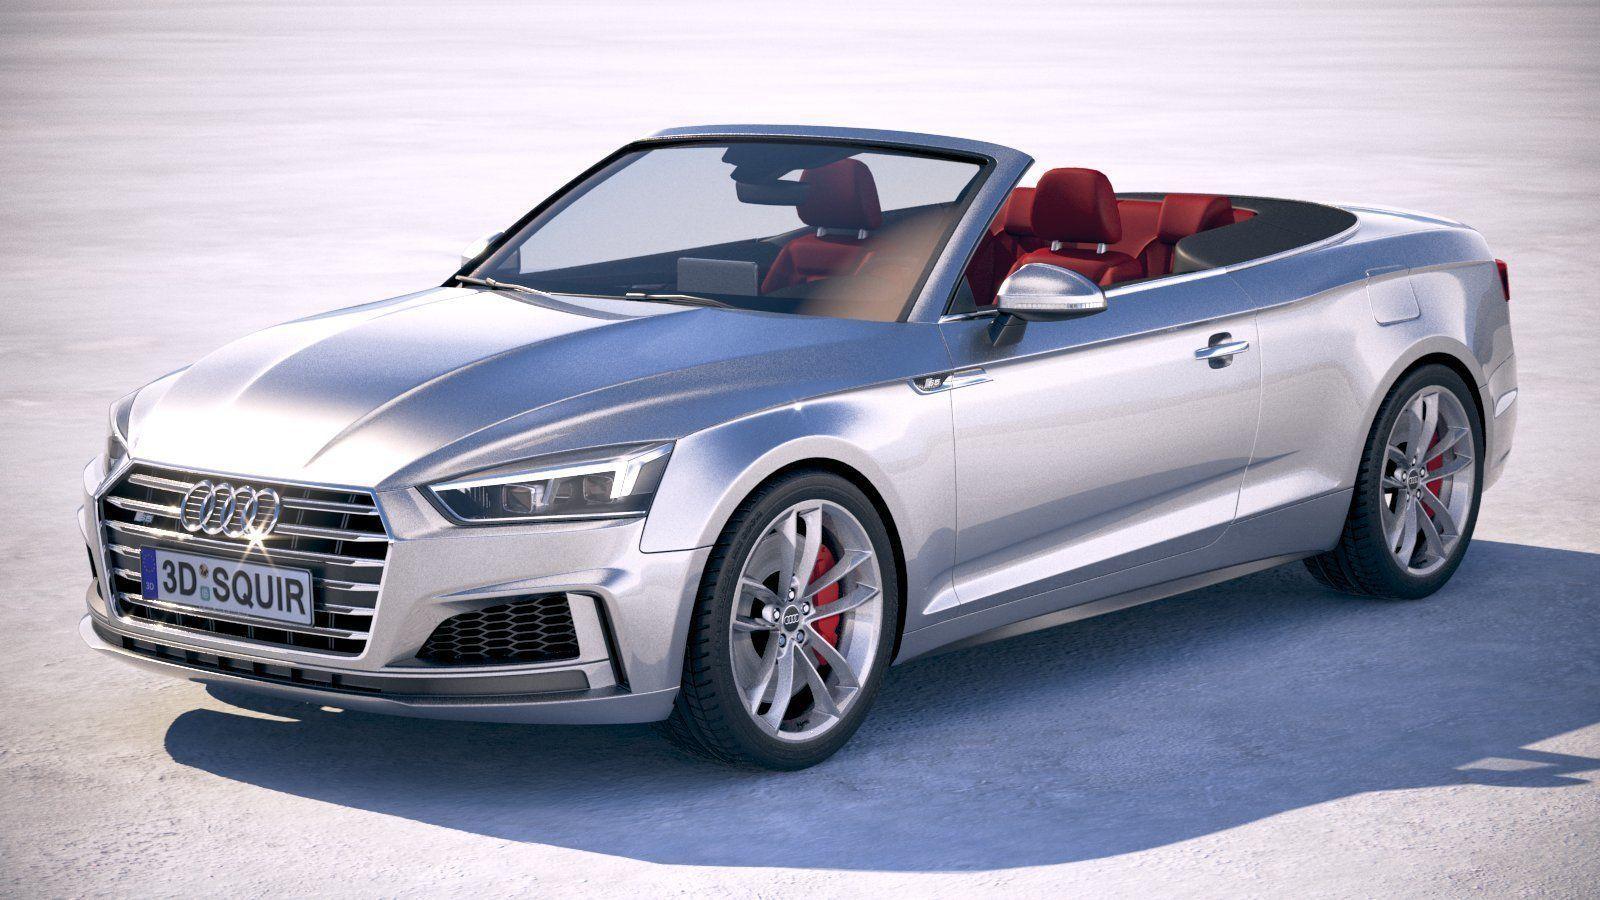 Audi S5 Cabriolet 2019 3d Cgtrader